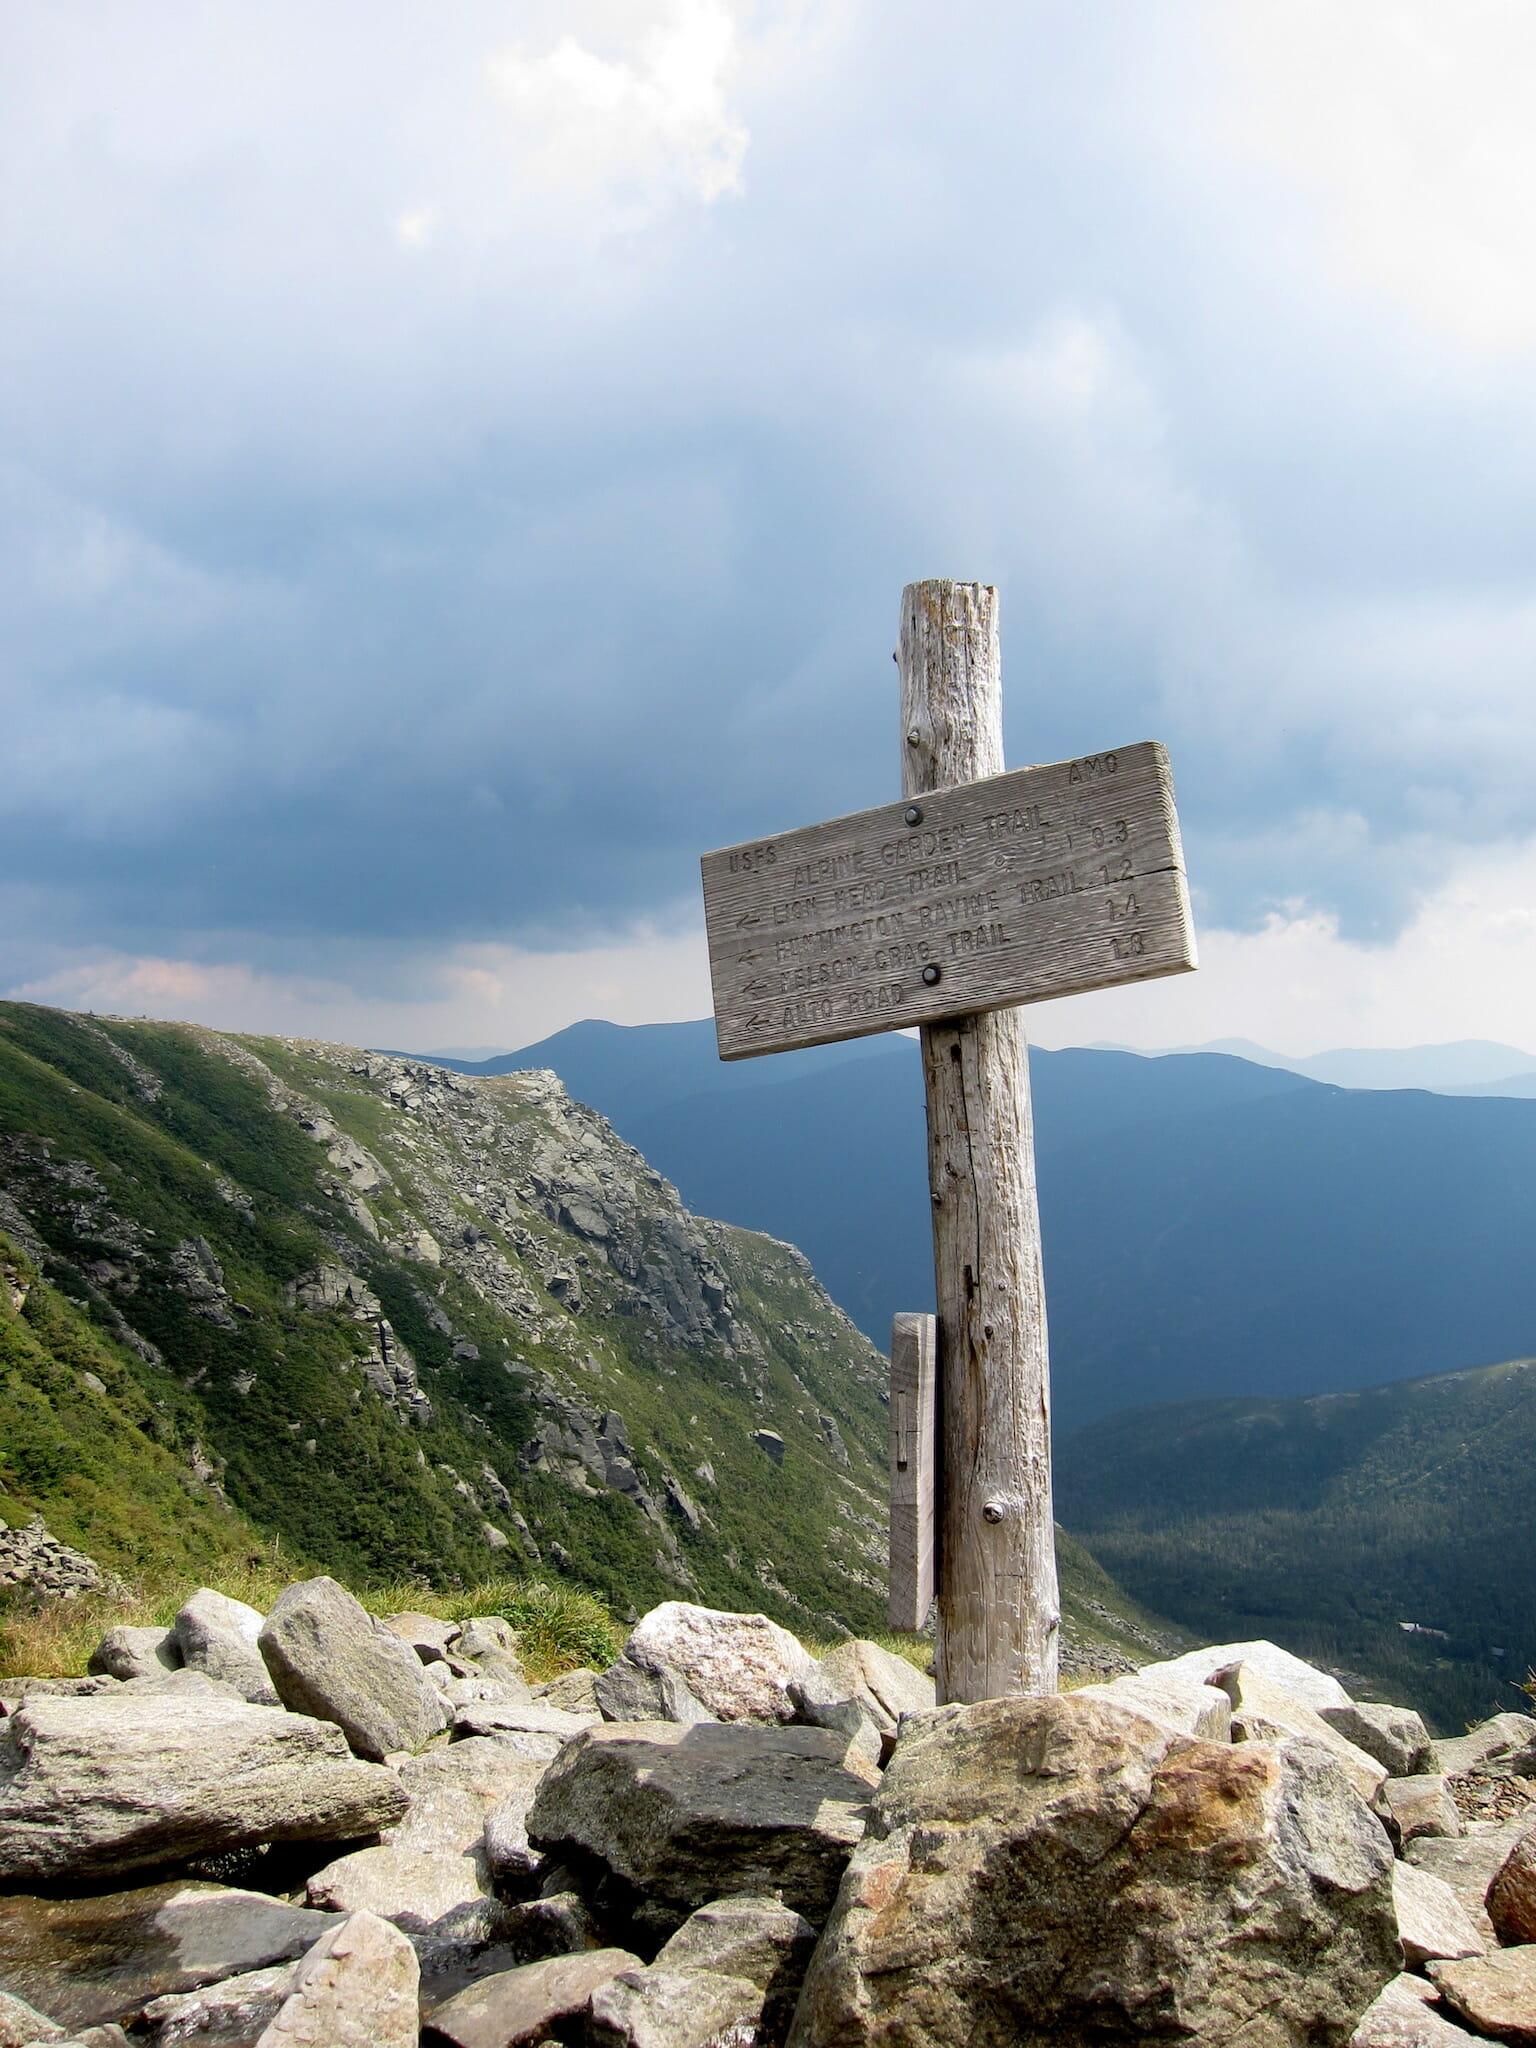 Trail sign at Alpine Garden & Tuckerman Ravine Junction, with Lion Head in the background